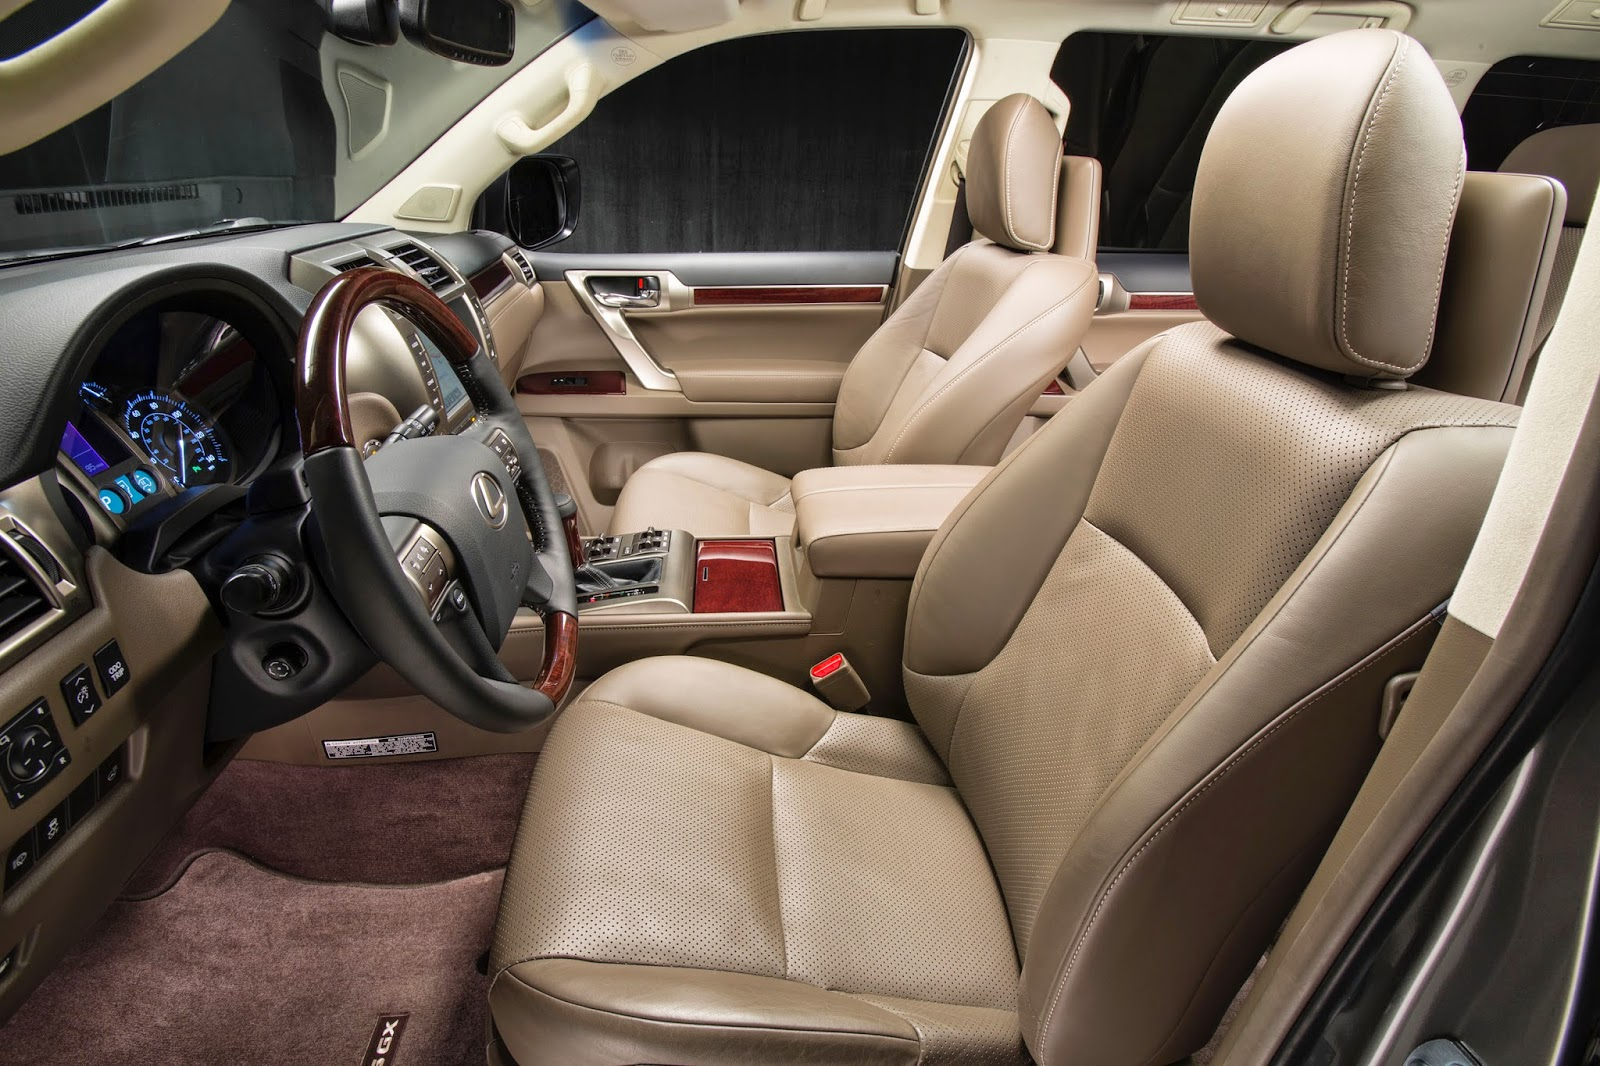 Interior view of 2015 Lexus GX460